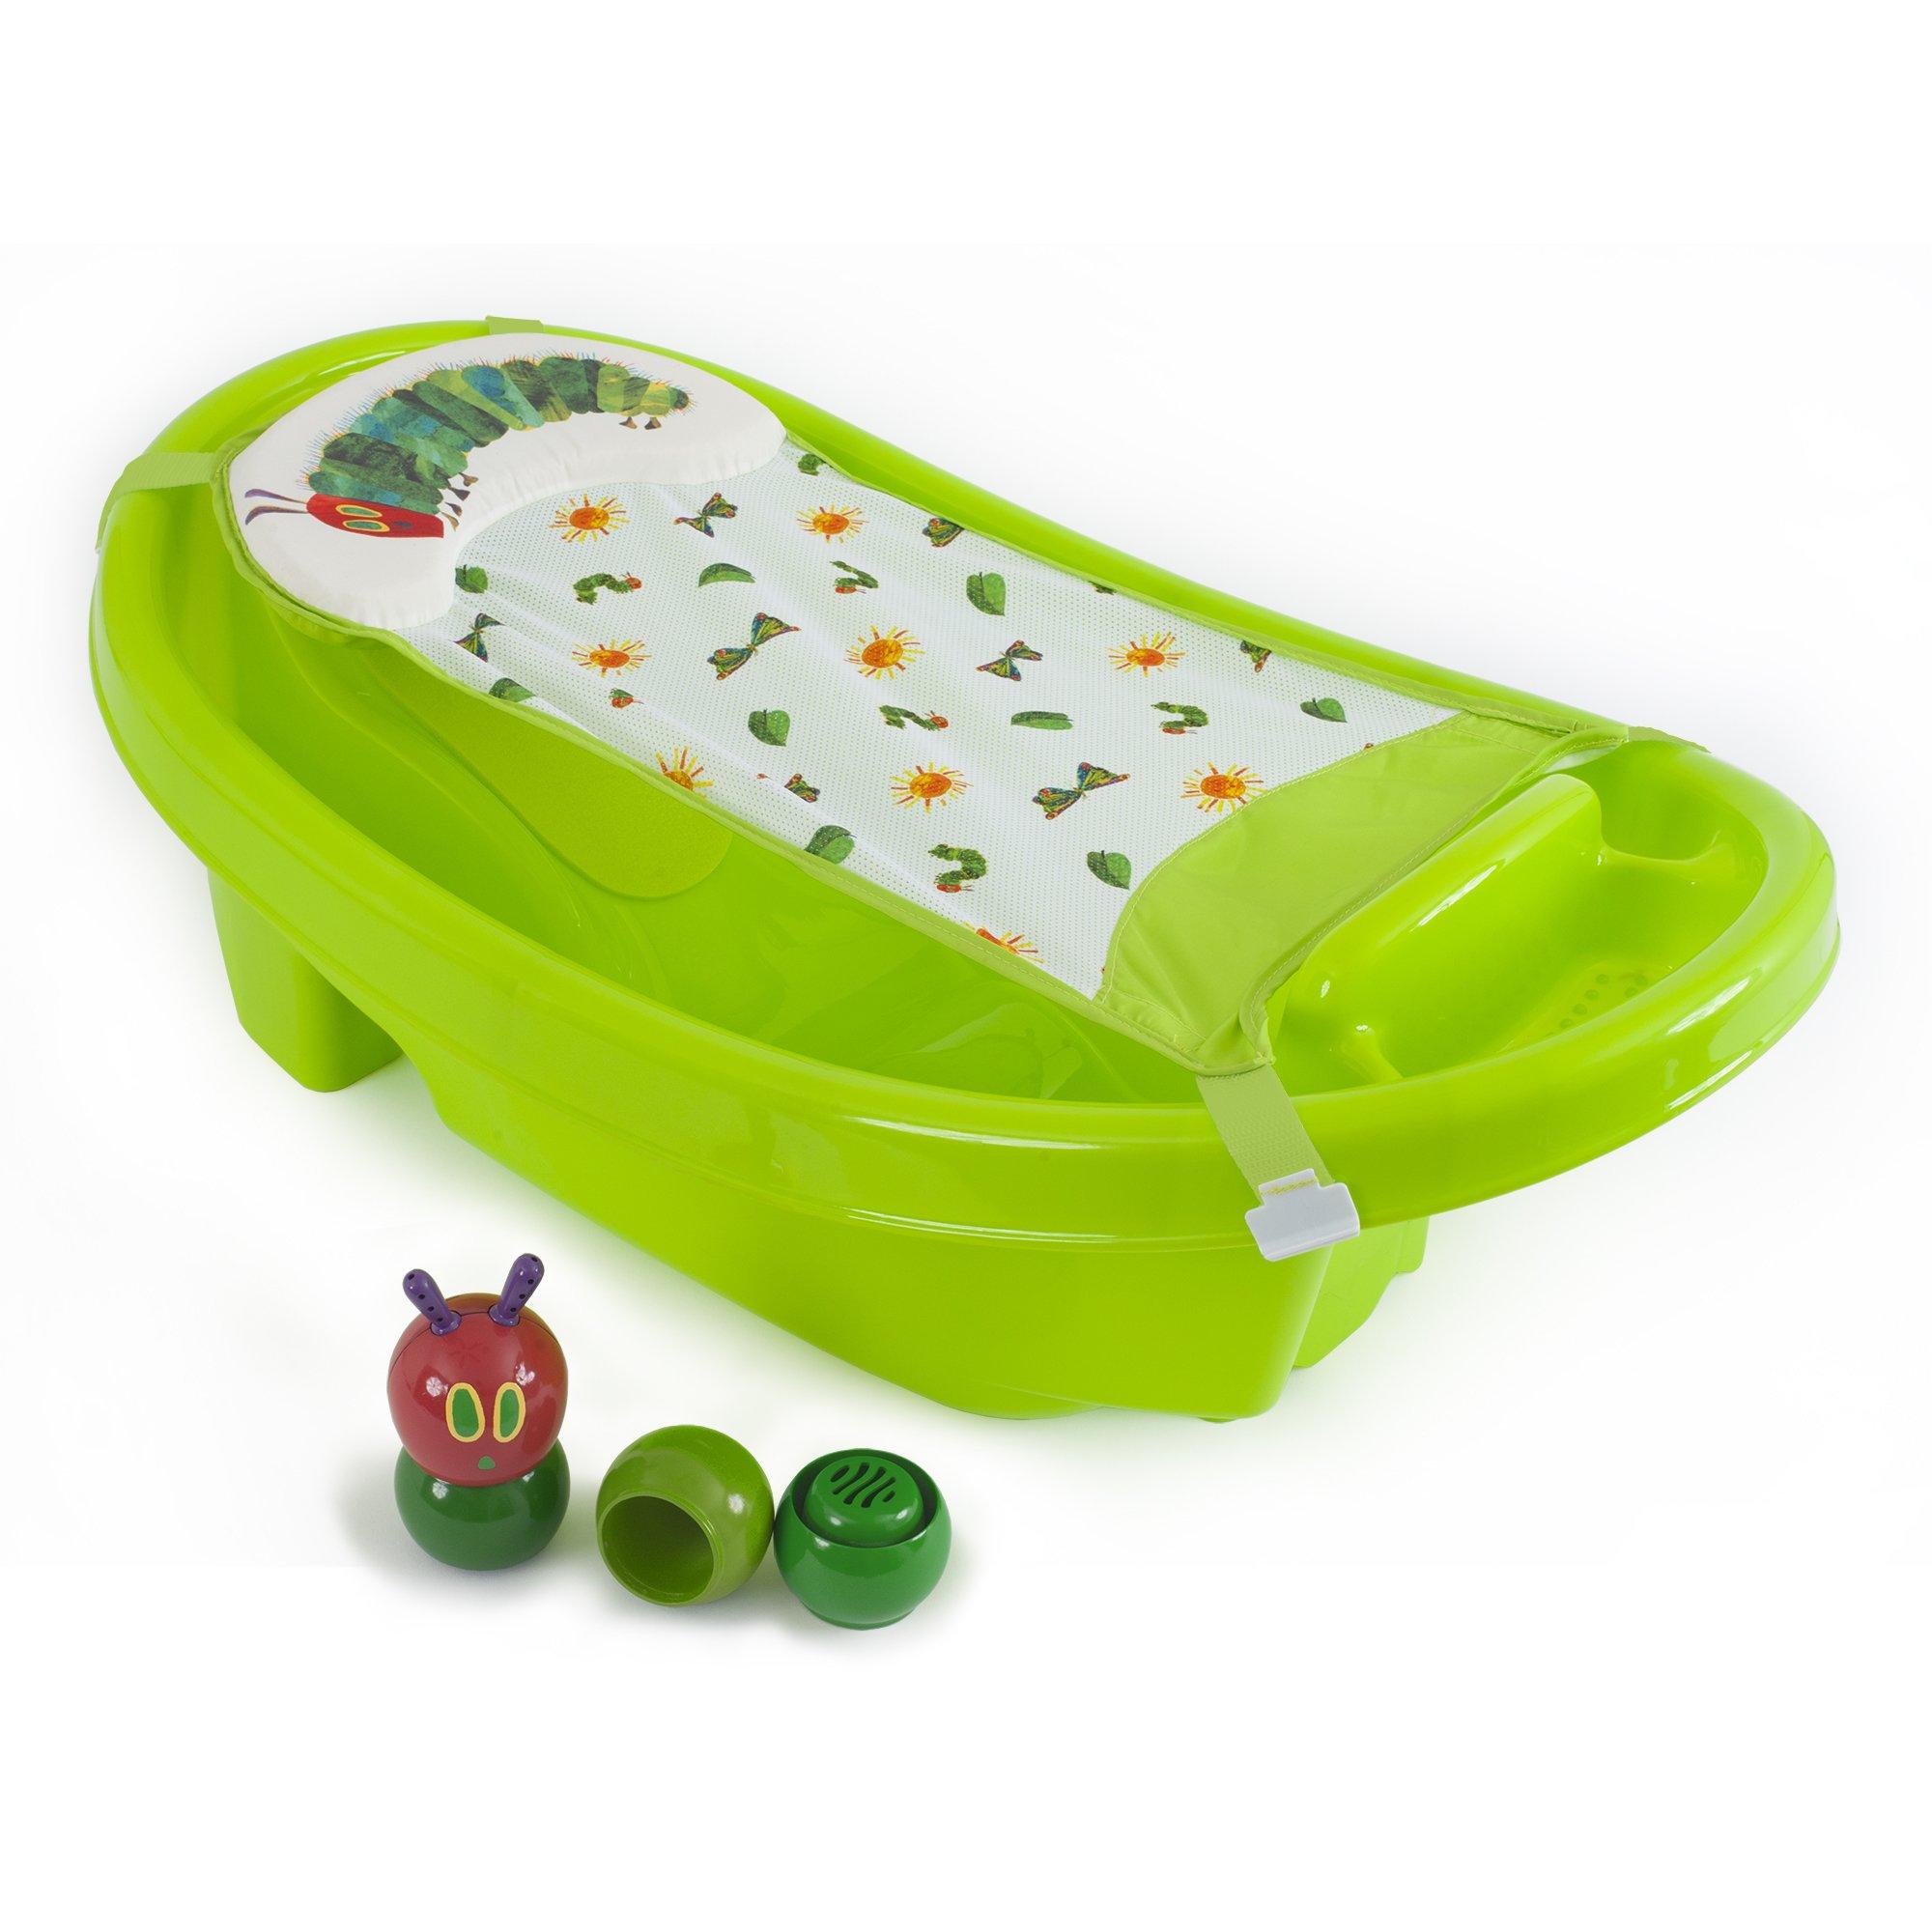 The World of Eric Carle Creative Baby Caterpillar Deluxe Bath Tub, Green